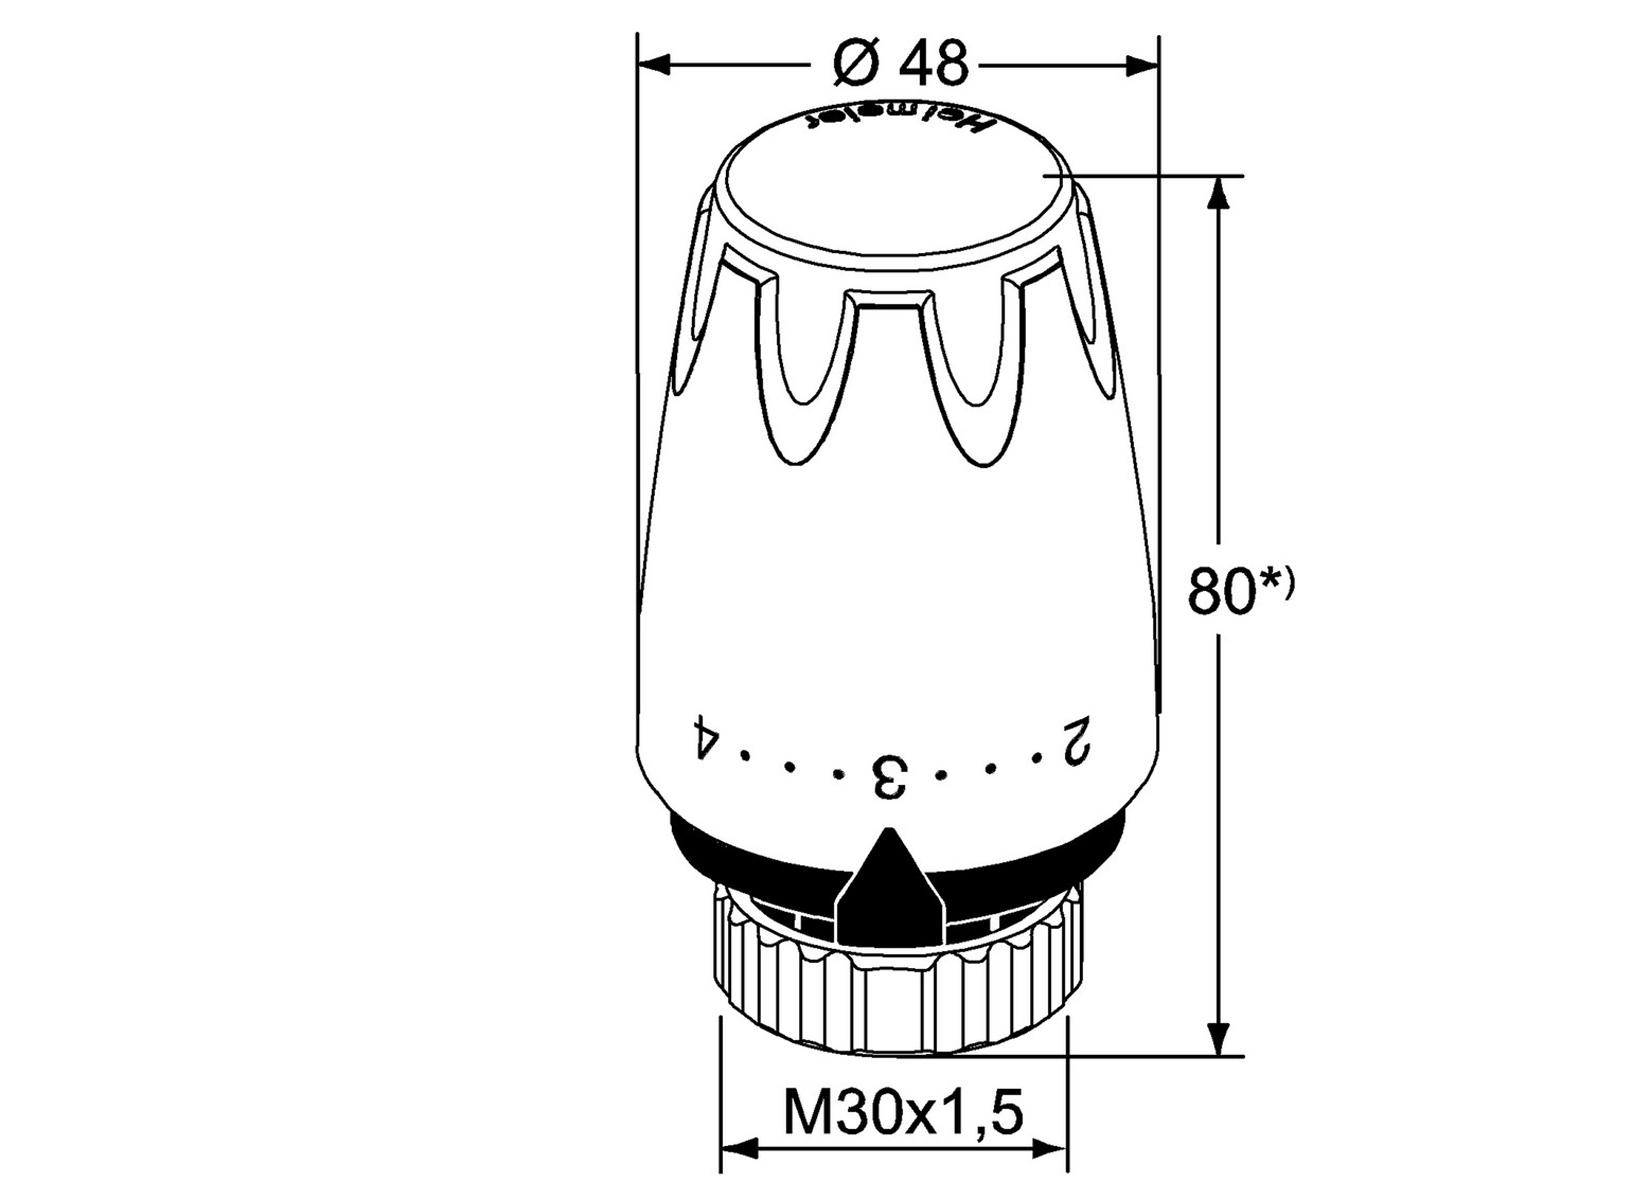 heimeier thermostatkopf dx weiss thermostatf u00fchler